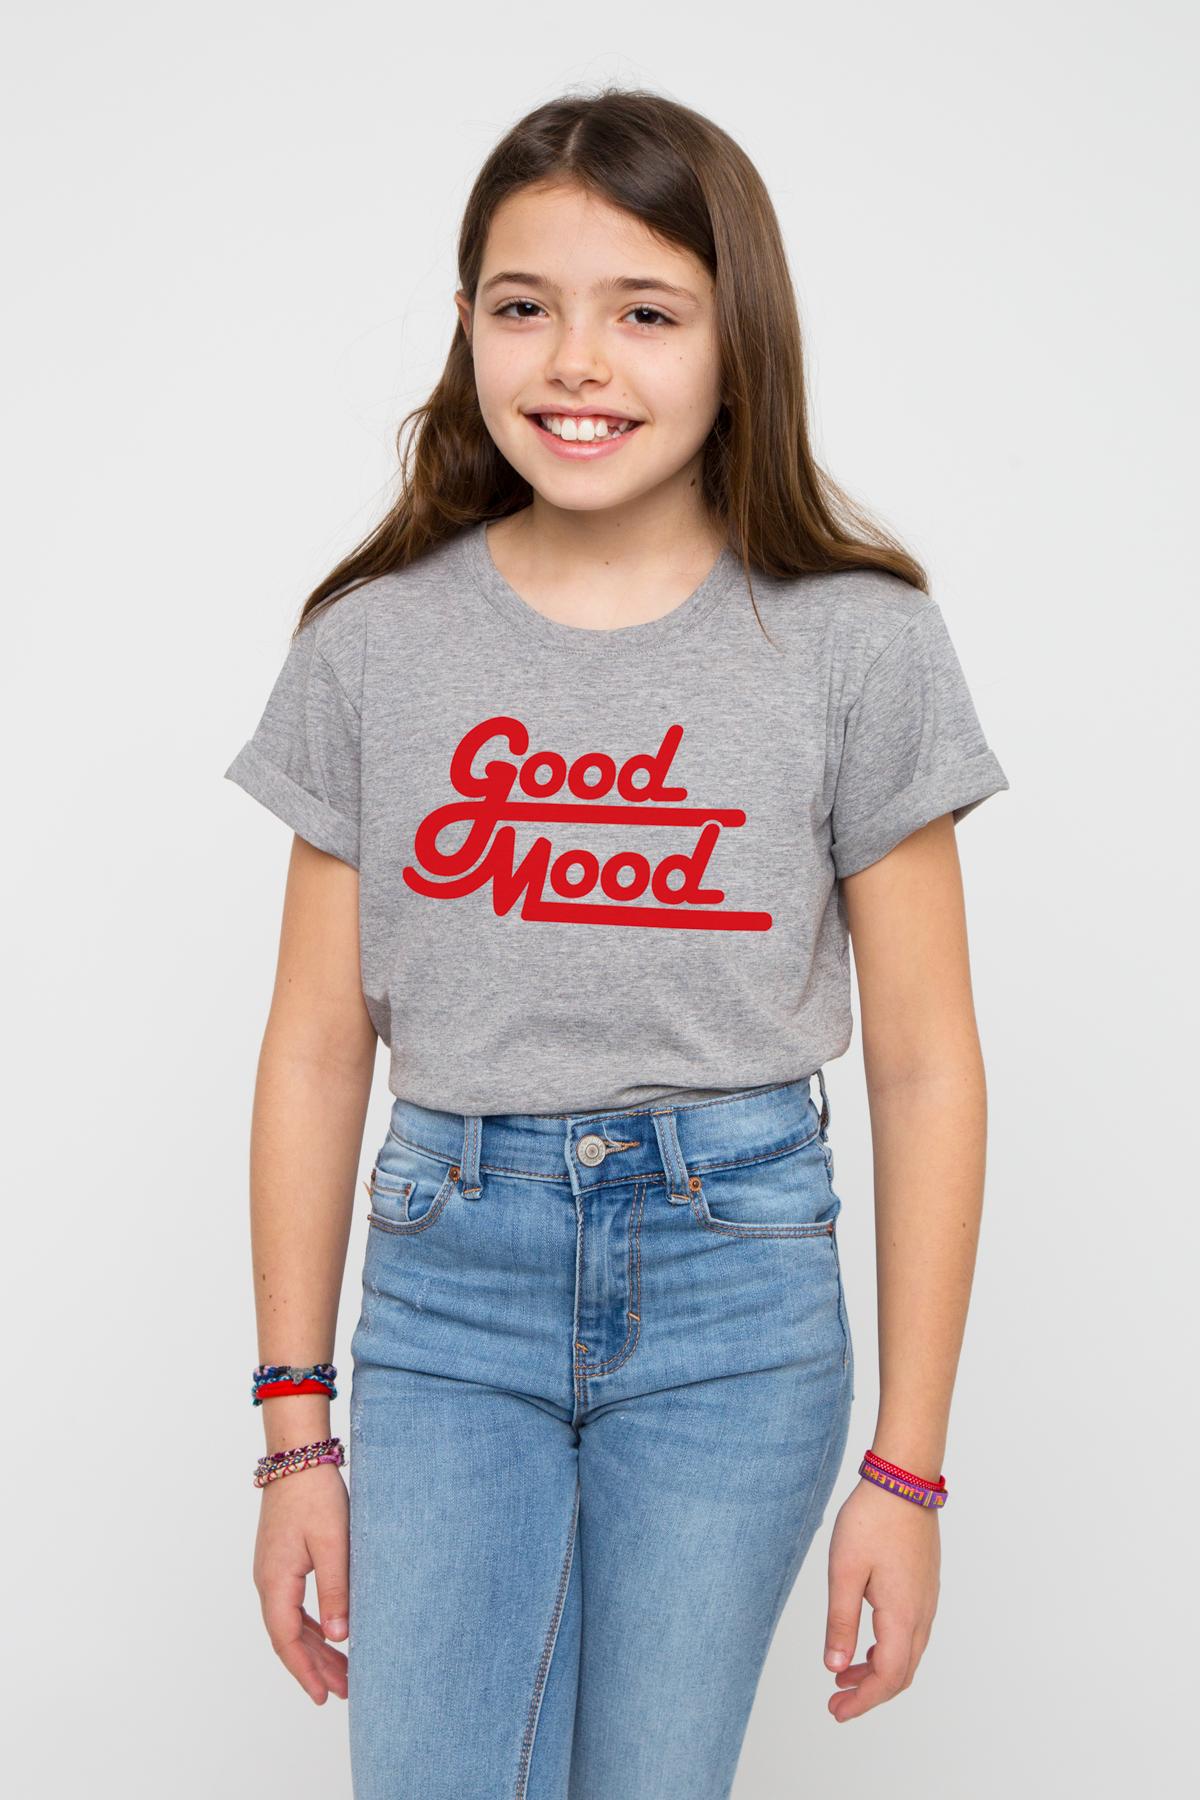 Tshirt GOOD MOOD French Disorder